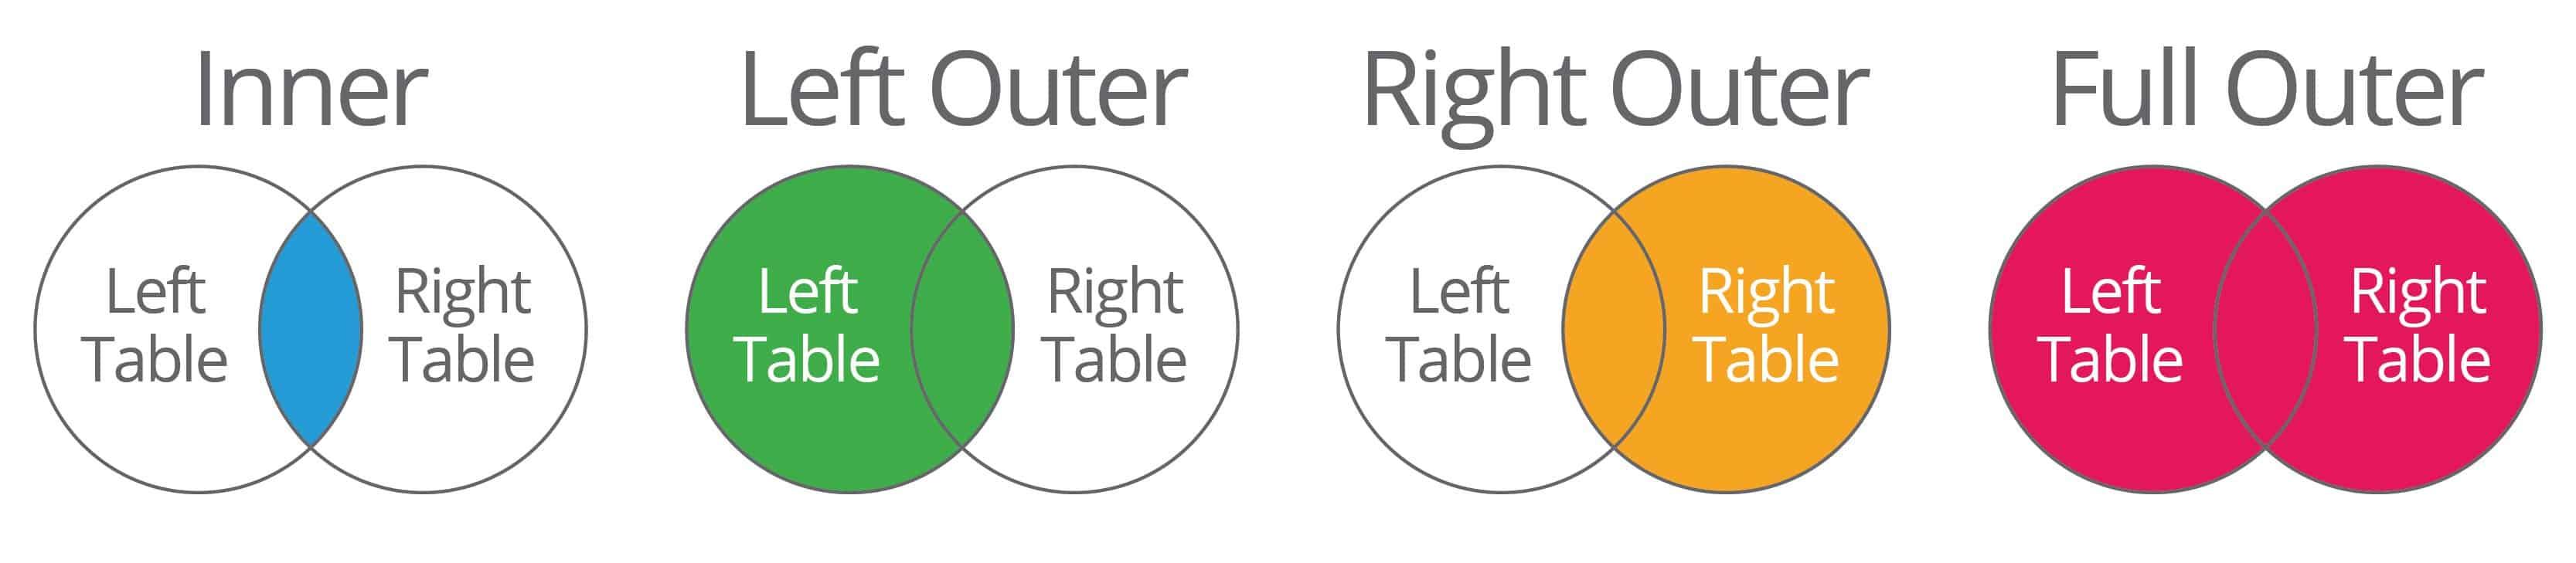 A basic primer on database relationships smartsheet sql join examples relational databases venn diagramm ccuart Gallery